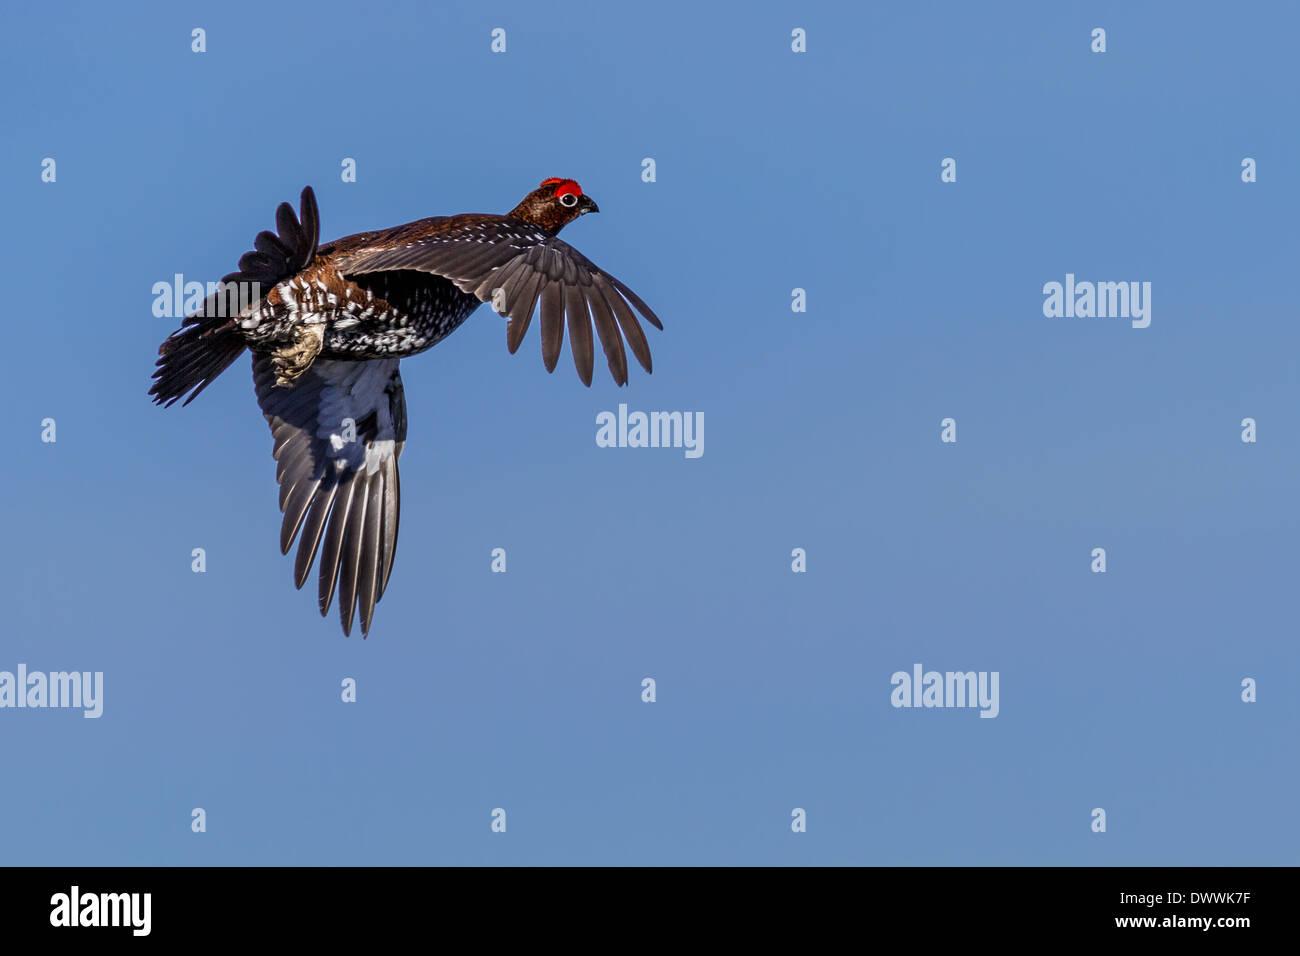 Wildlife: Red grouse (lagopus lagopus) flying after taking off, England, UK - Stock Image